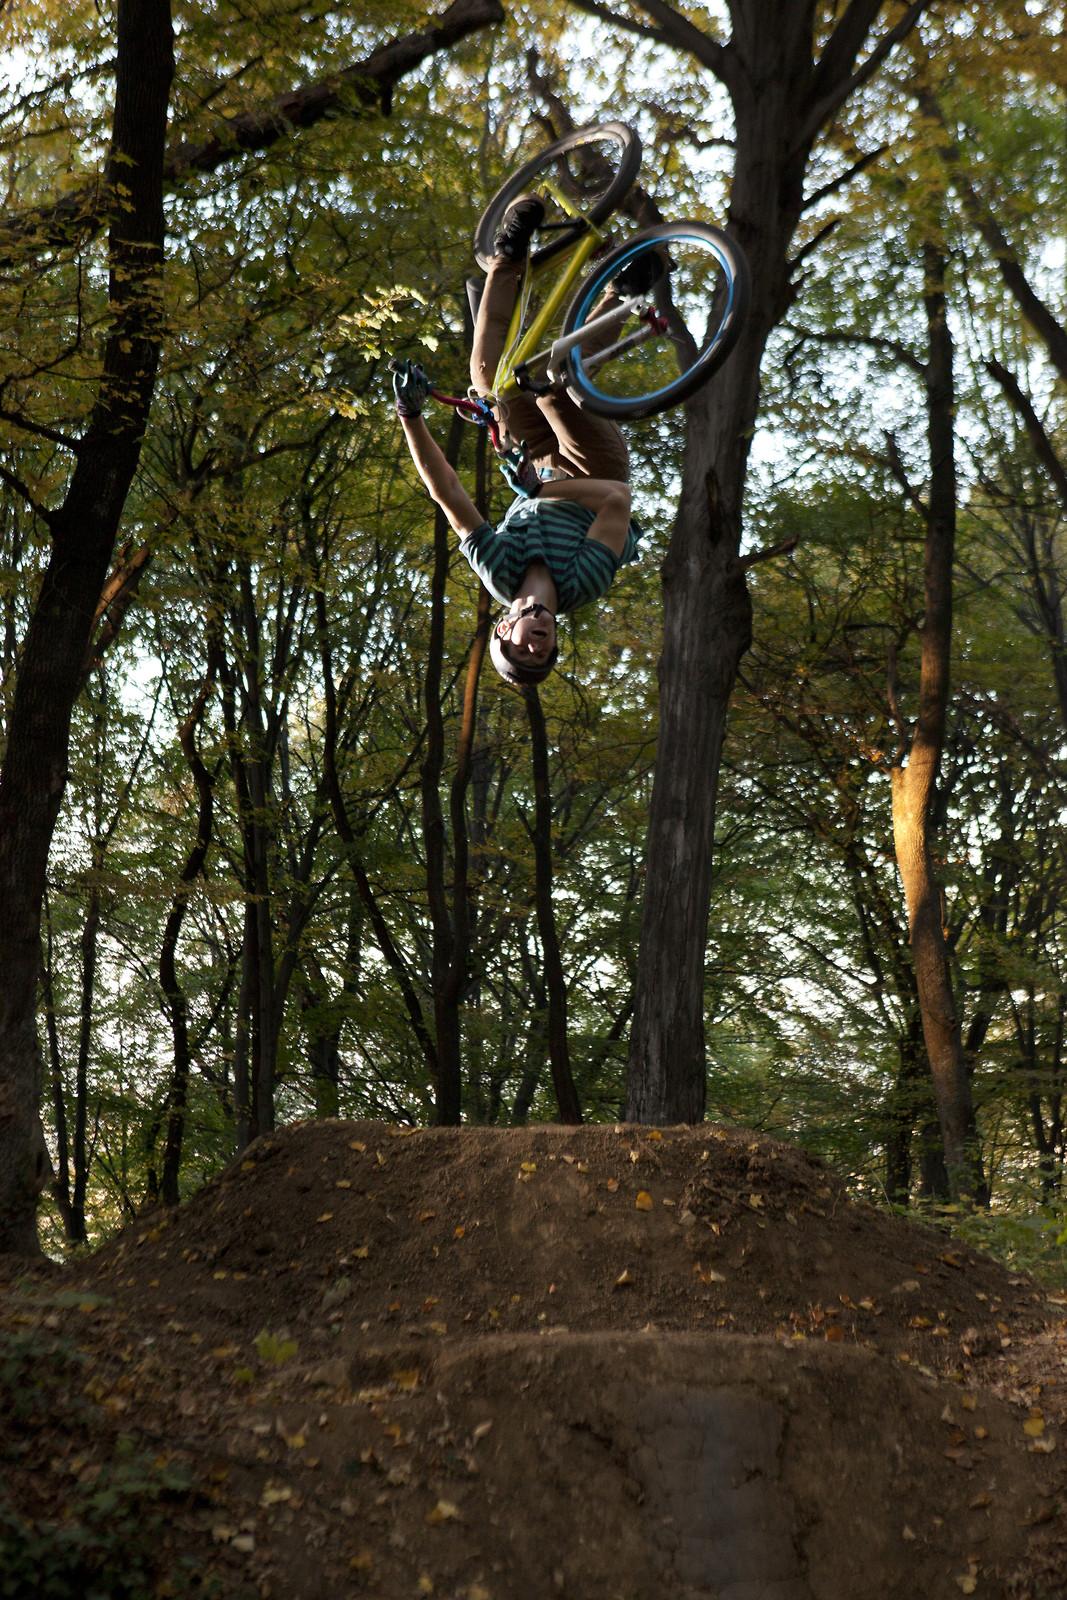 Christoph Baier - Dartmoor Bikes - Mountain Biking Pictures - Vital MTB